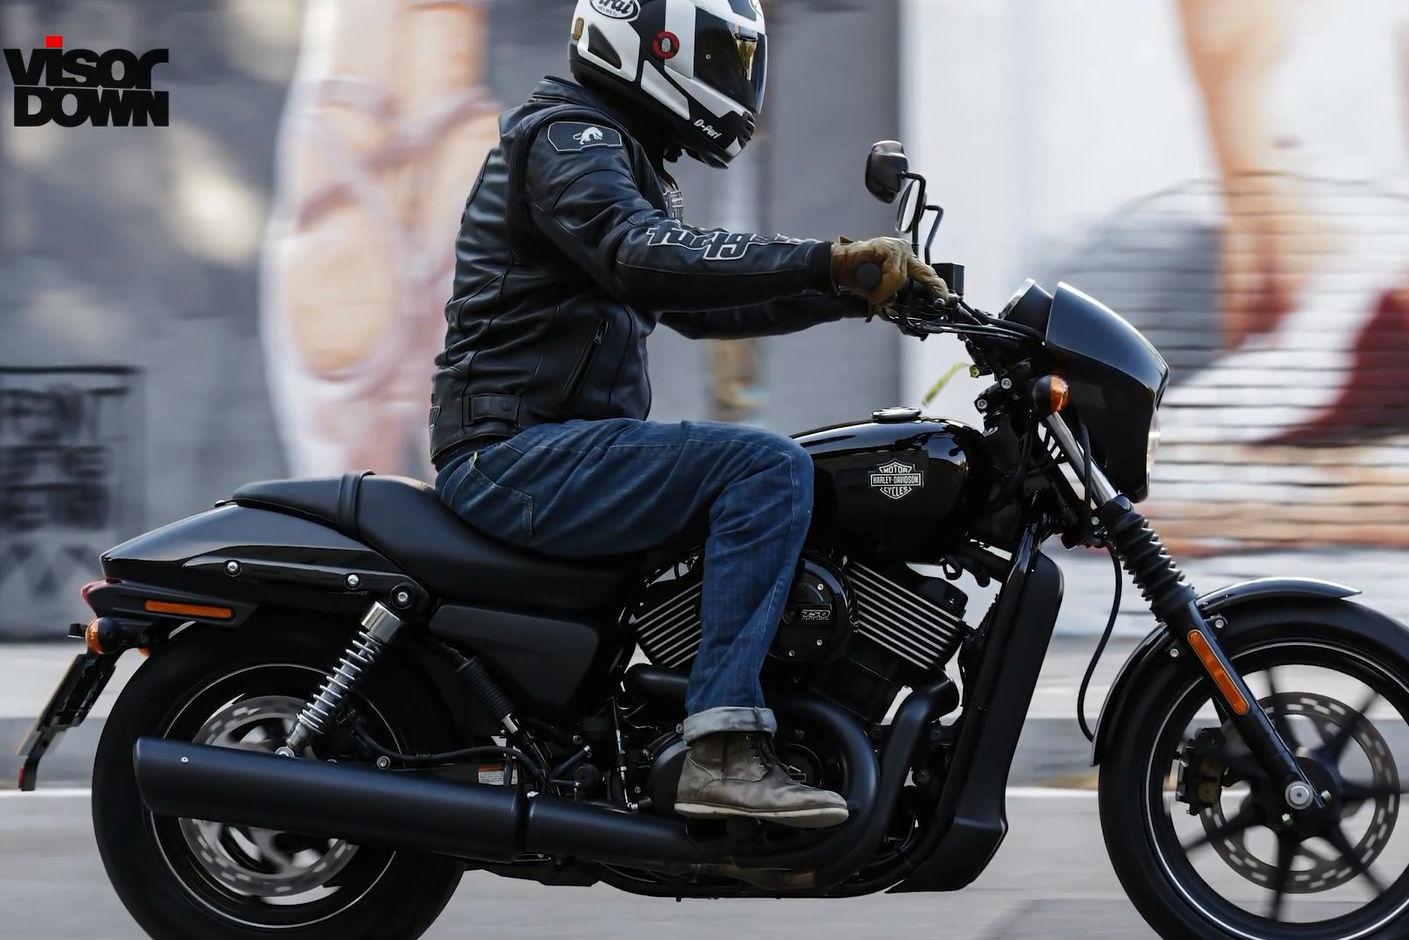 Video review: Harley-Davidson Street 750 road test